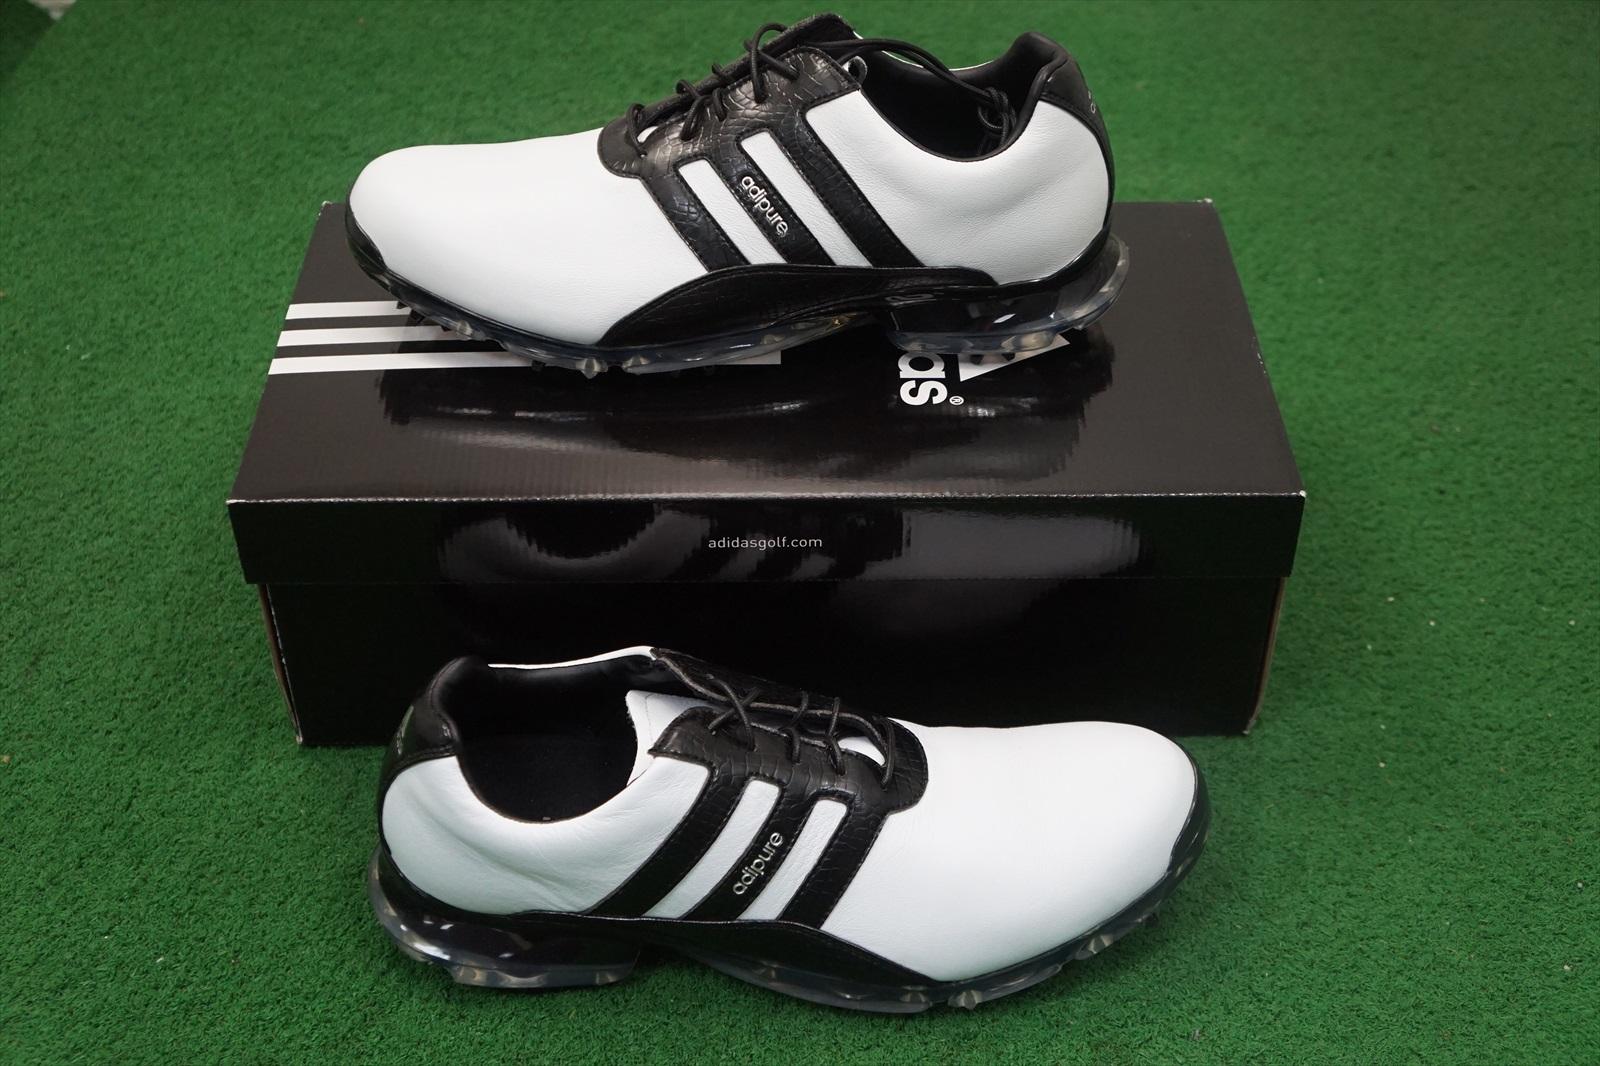 Nuove Adidas Adipure Classico Uomo / Golf Scarpa 9 Nero / Uomo Bianco Q44839 d8752d